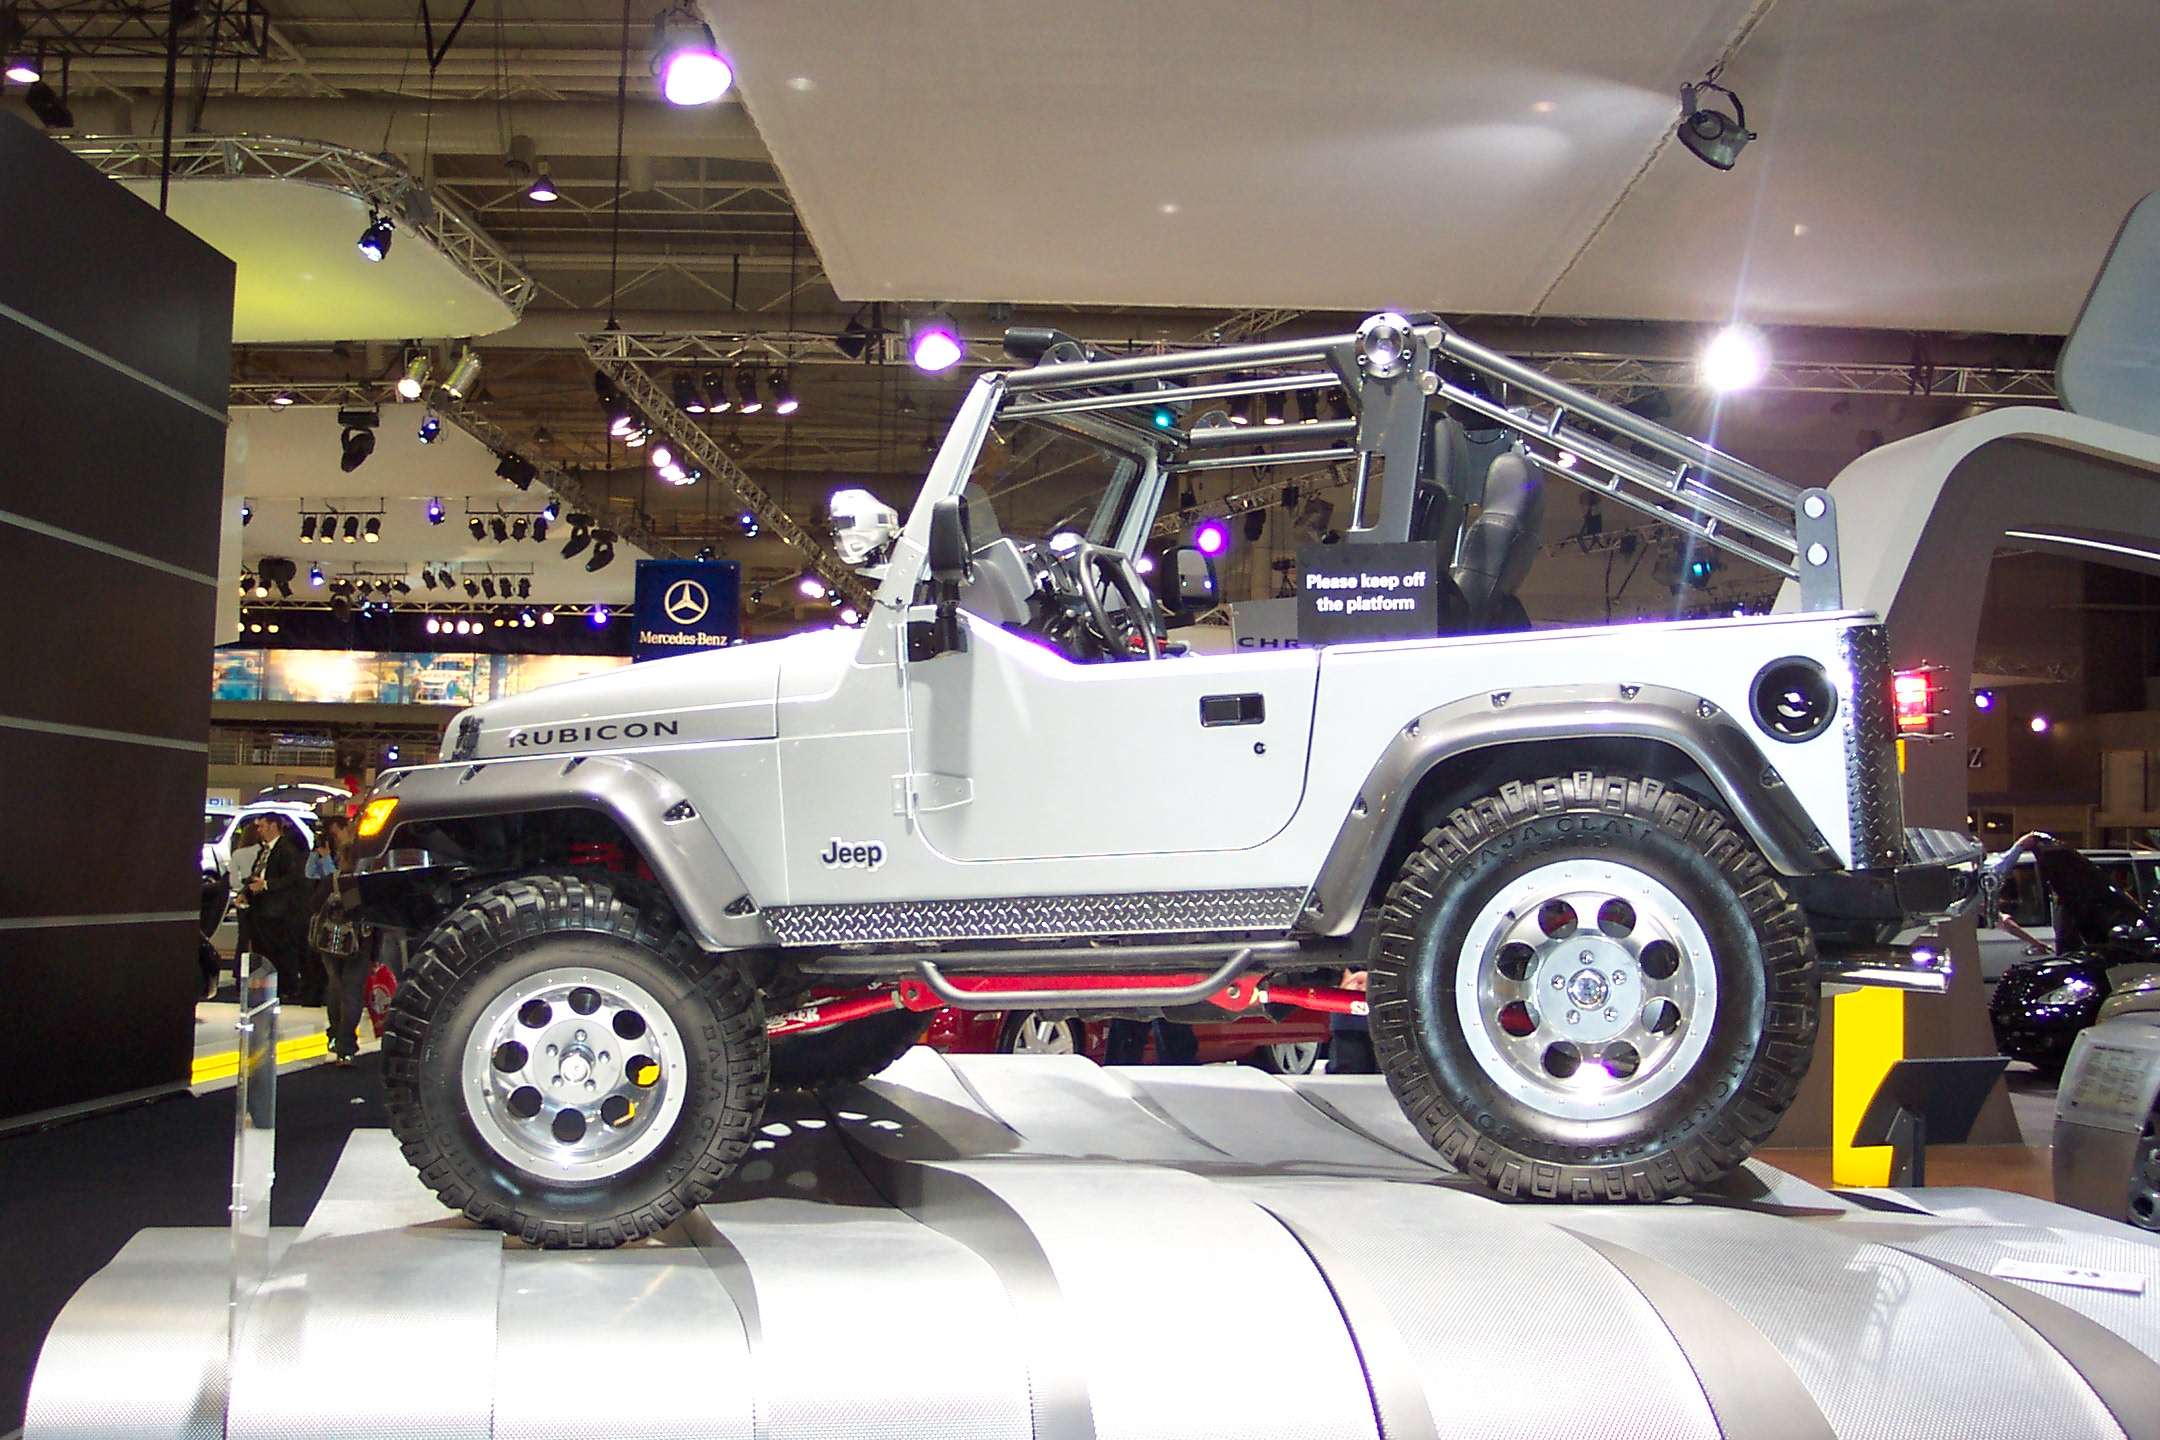 Jeep Wrangler Wiki >> File:2003 Jeep Wrangler Rubicon - Tomb Raider 2 - Lara Croft's Jeep (5059570778).jpg - Wikimedia ...